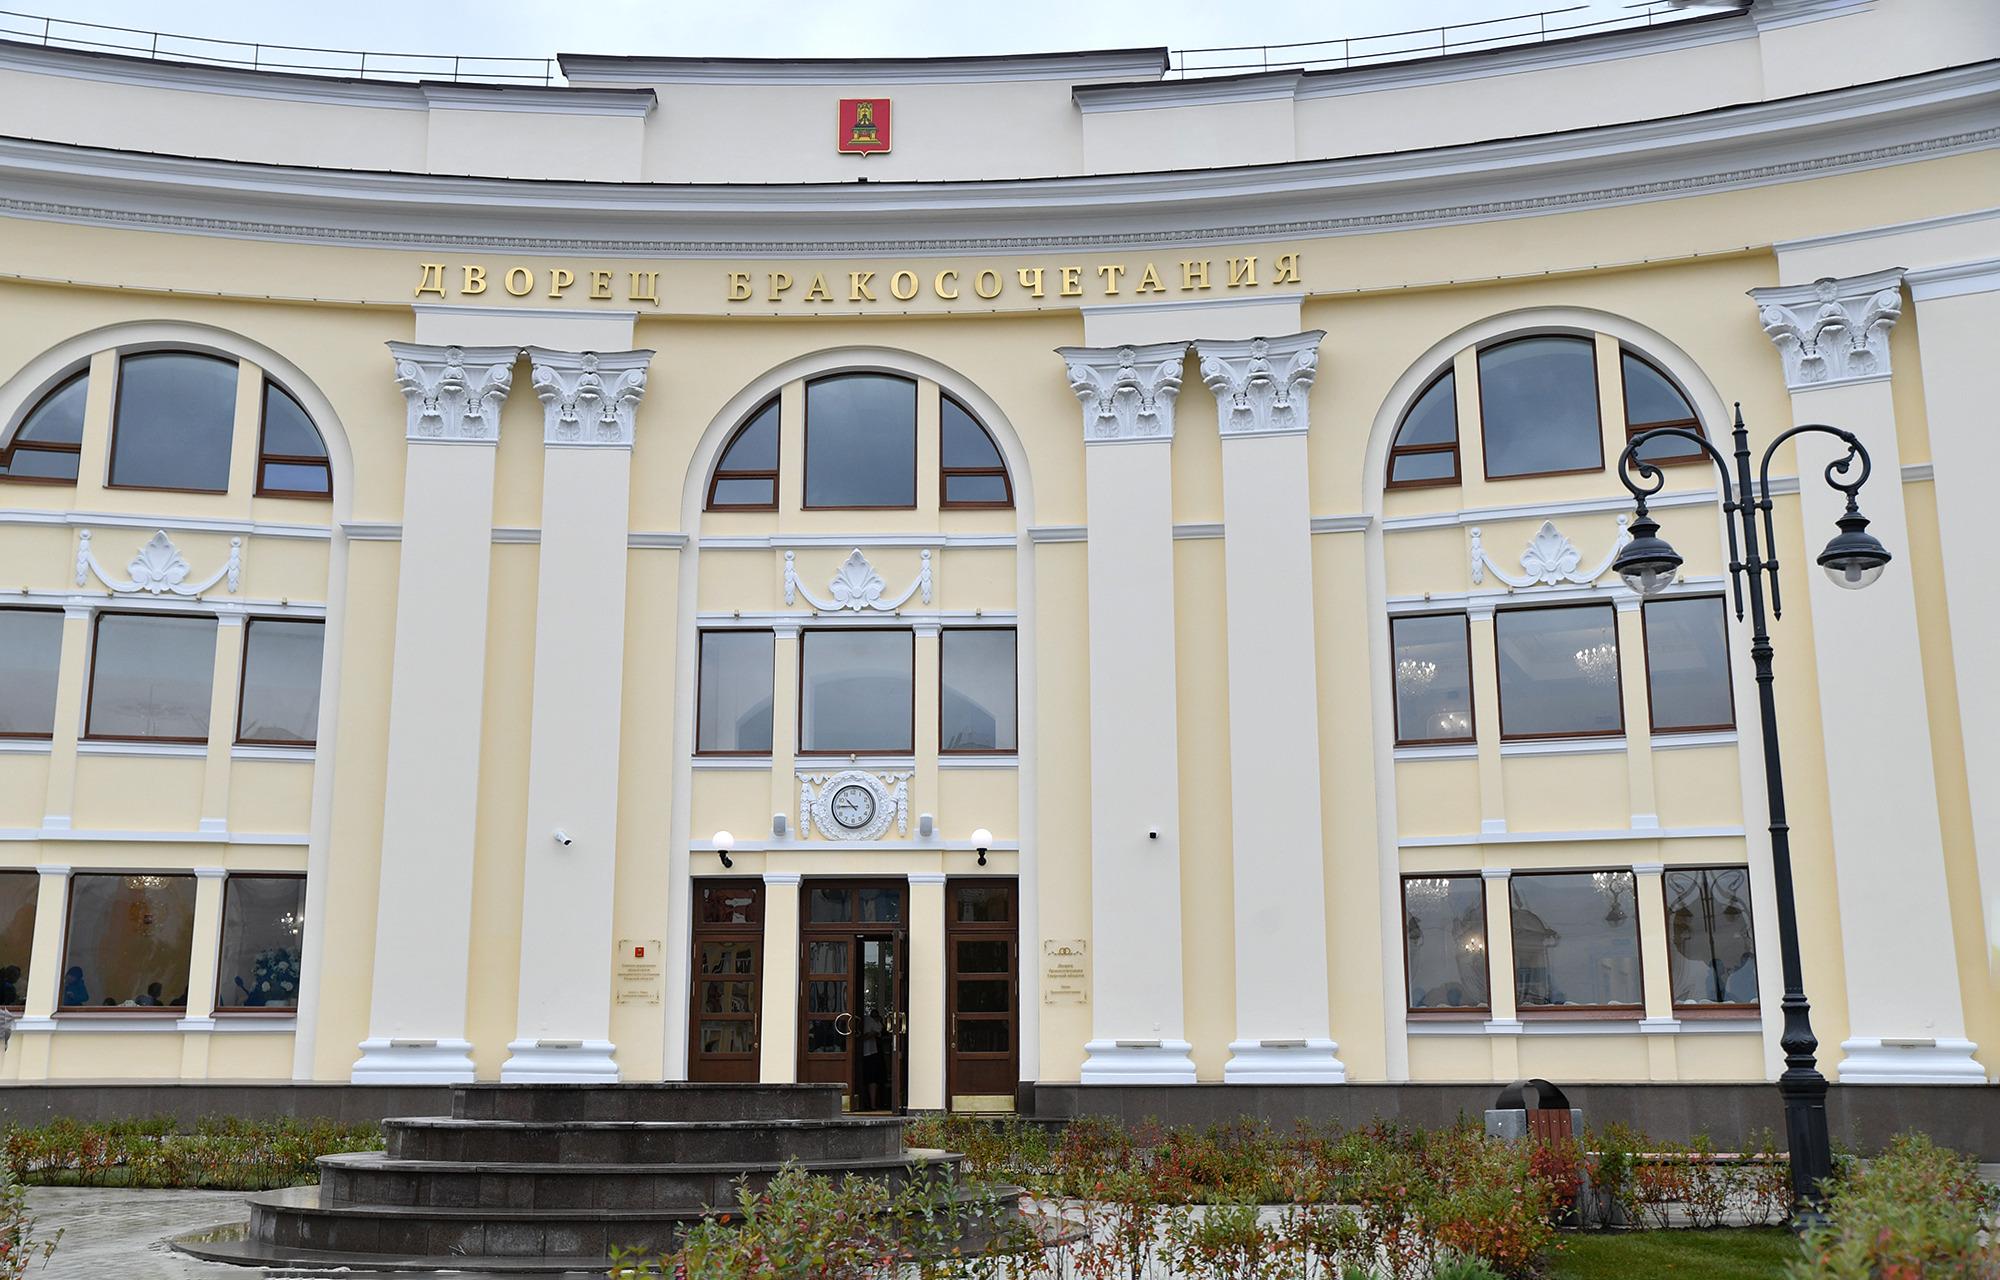 В Твери открыли Дворец бракосочетания